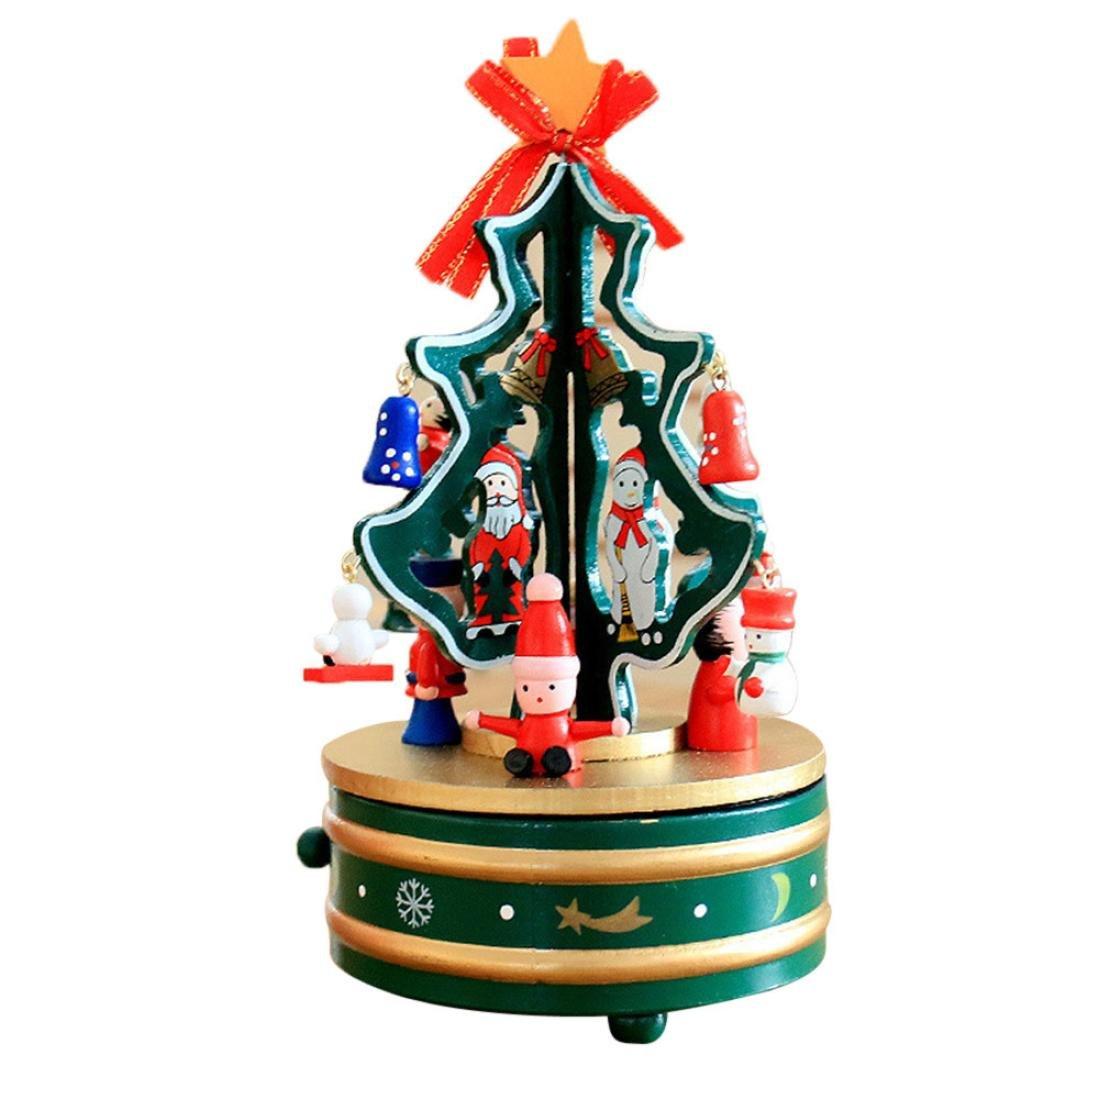 Alonea Rotating Music Christmas Tree Christmas Gift Music Box Indoor Decoration (B)